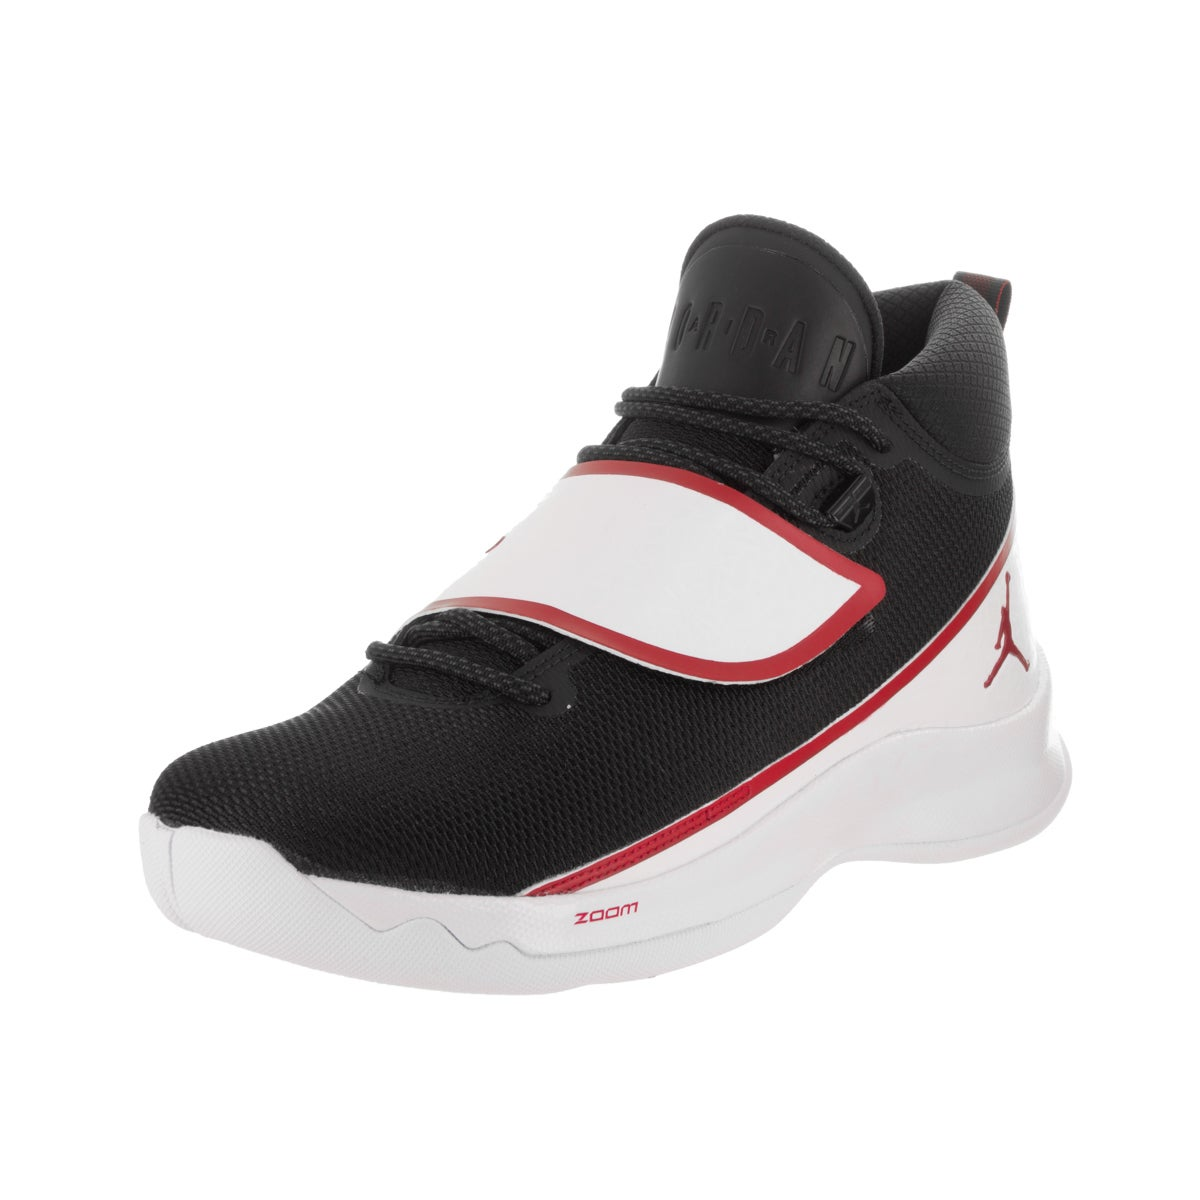 f9dbf1cf1bc0 Details about Nike Jordan Men s Jordan Super.Fly 5 PO Black Basketball Shoe